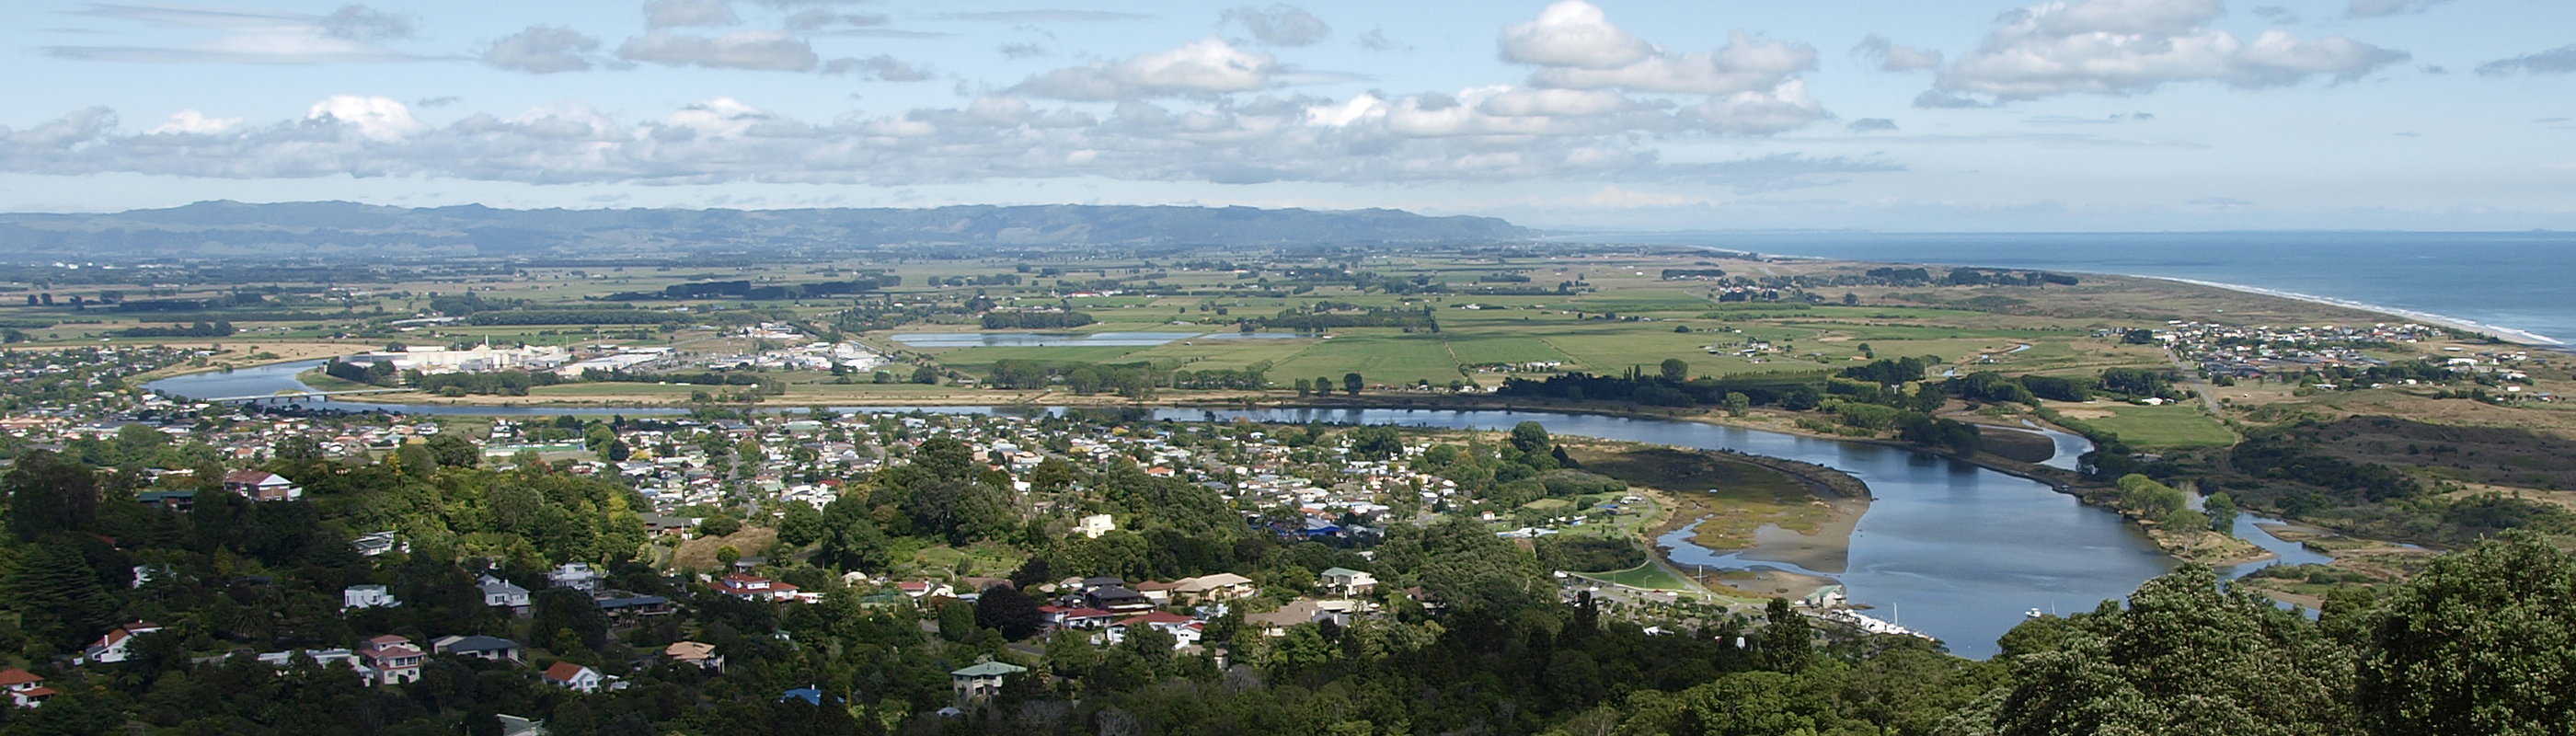 Whakatane New Zealand  City new picture : Whakatane with River and Hinterland Wikipedia, the free ...